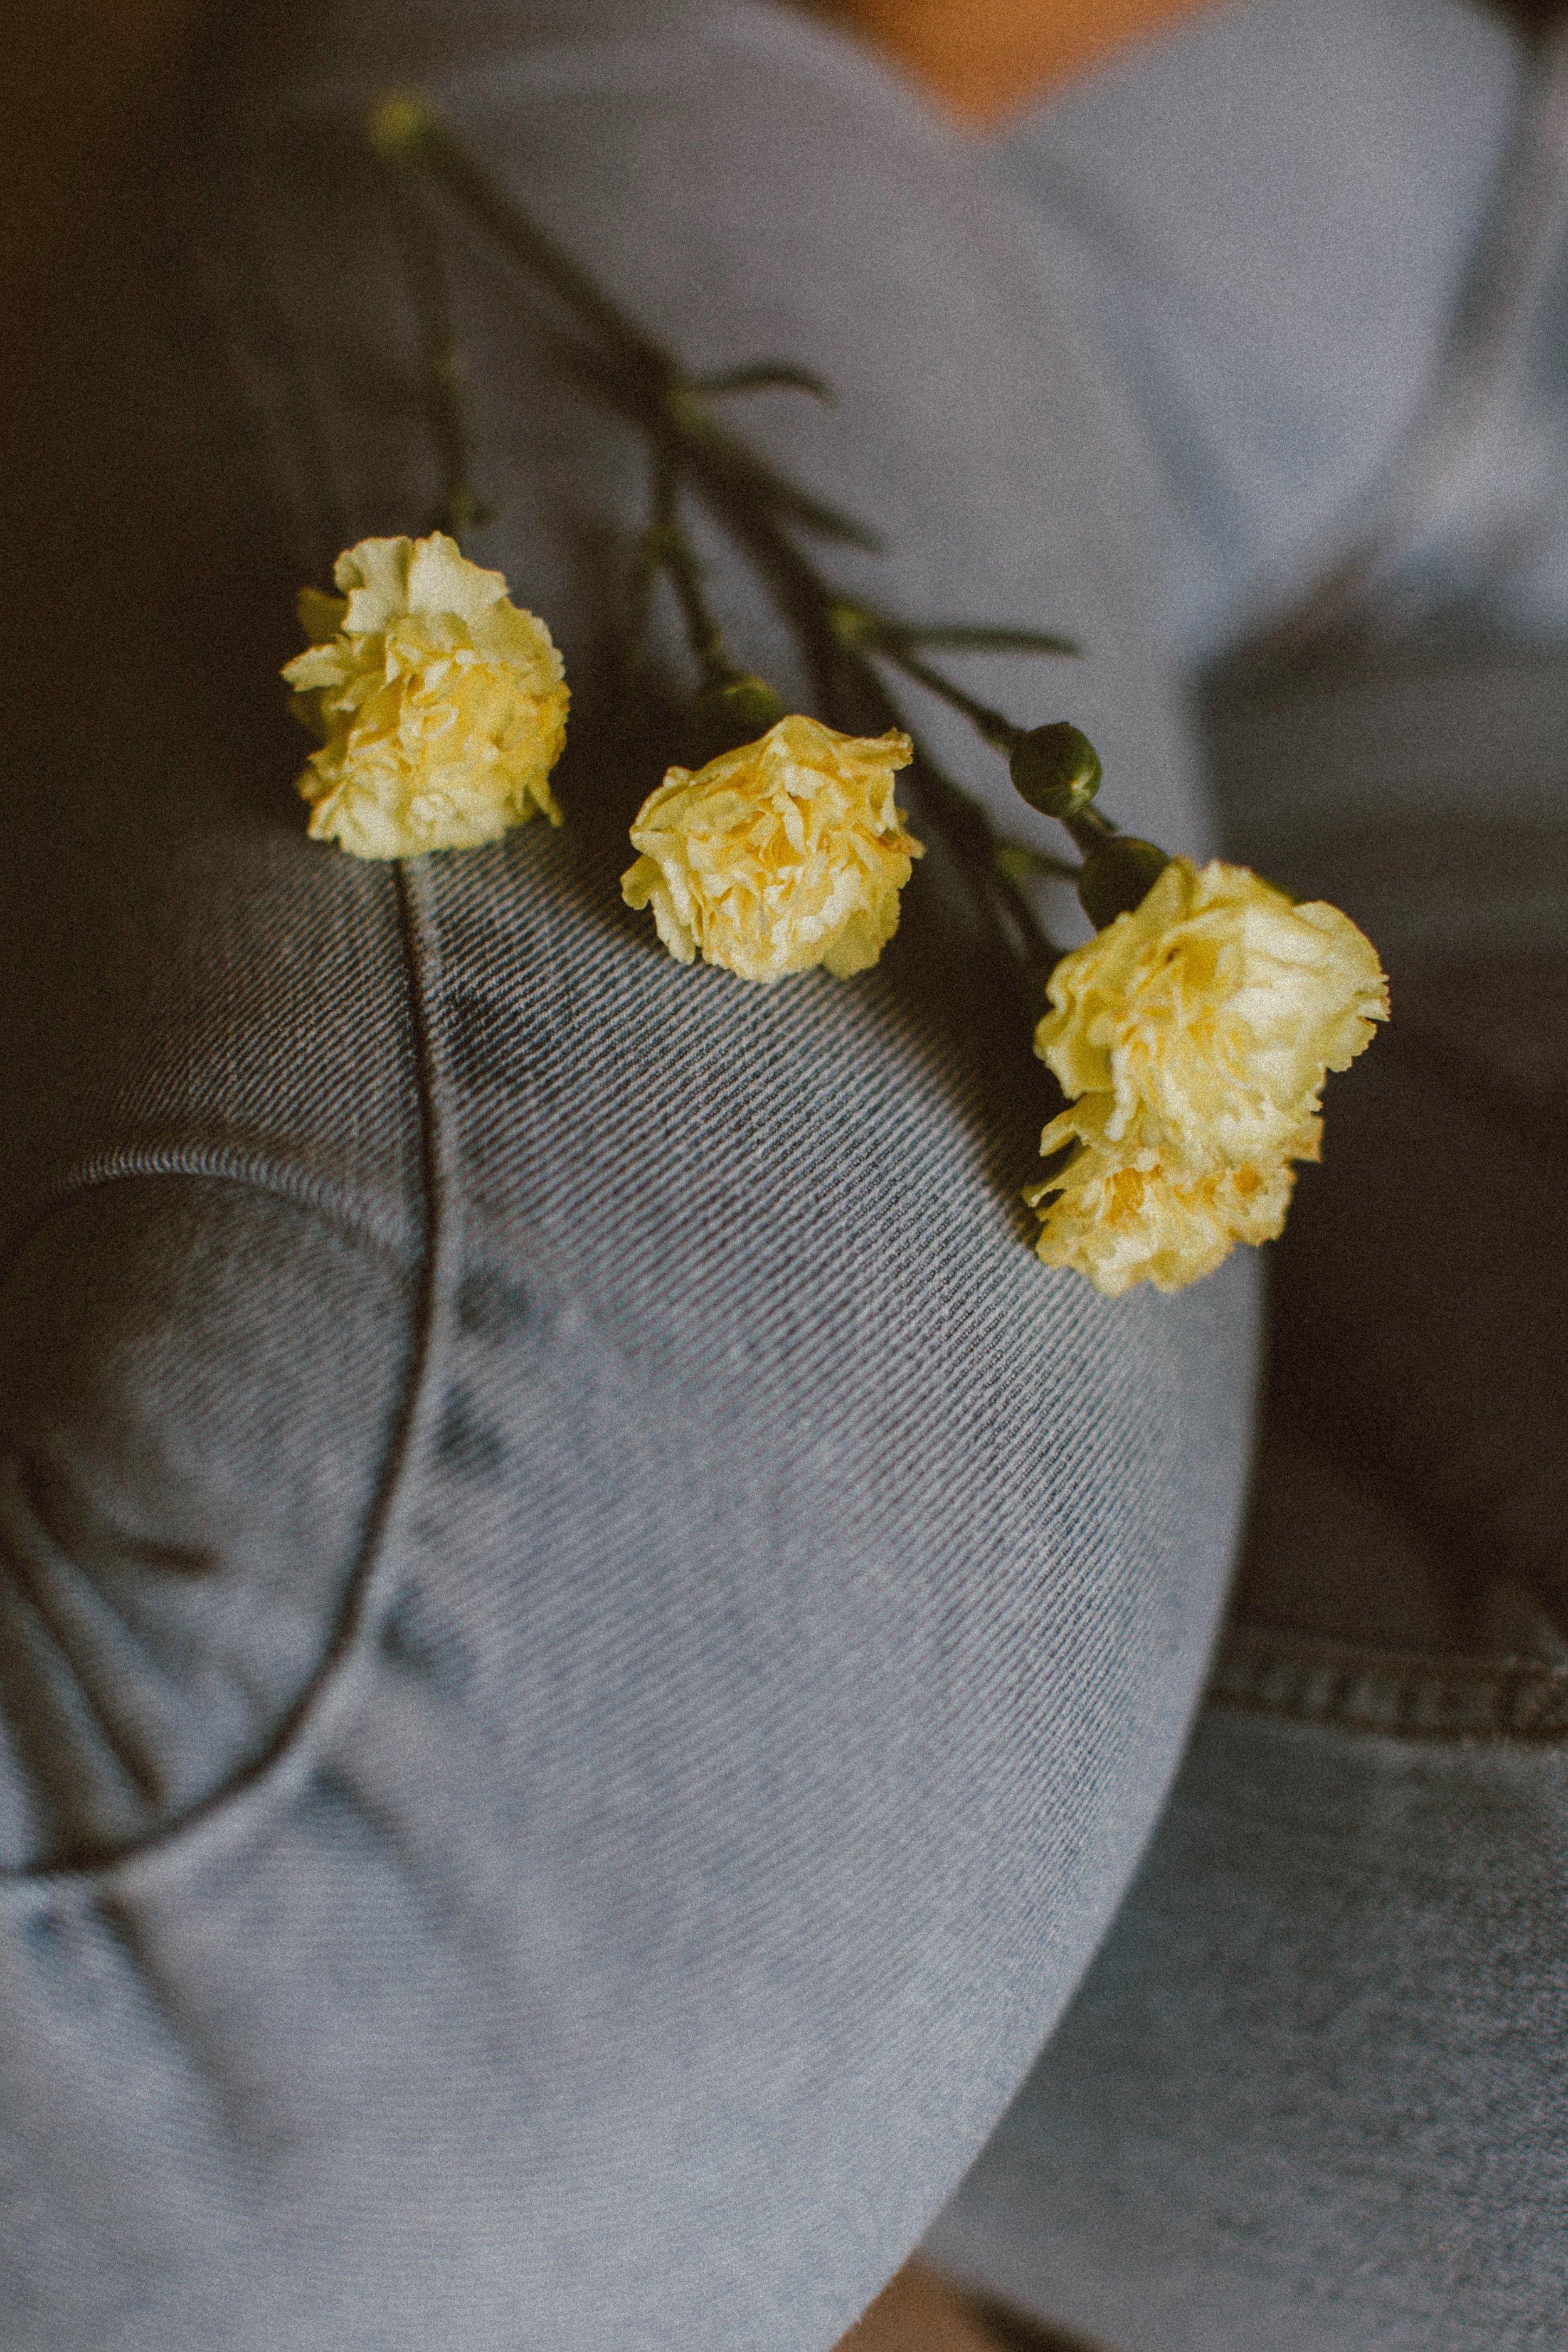 frank-flores-464933-unsplash.jpg